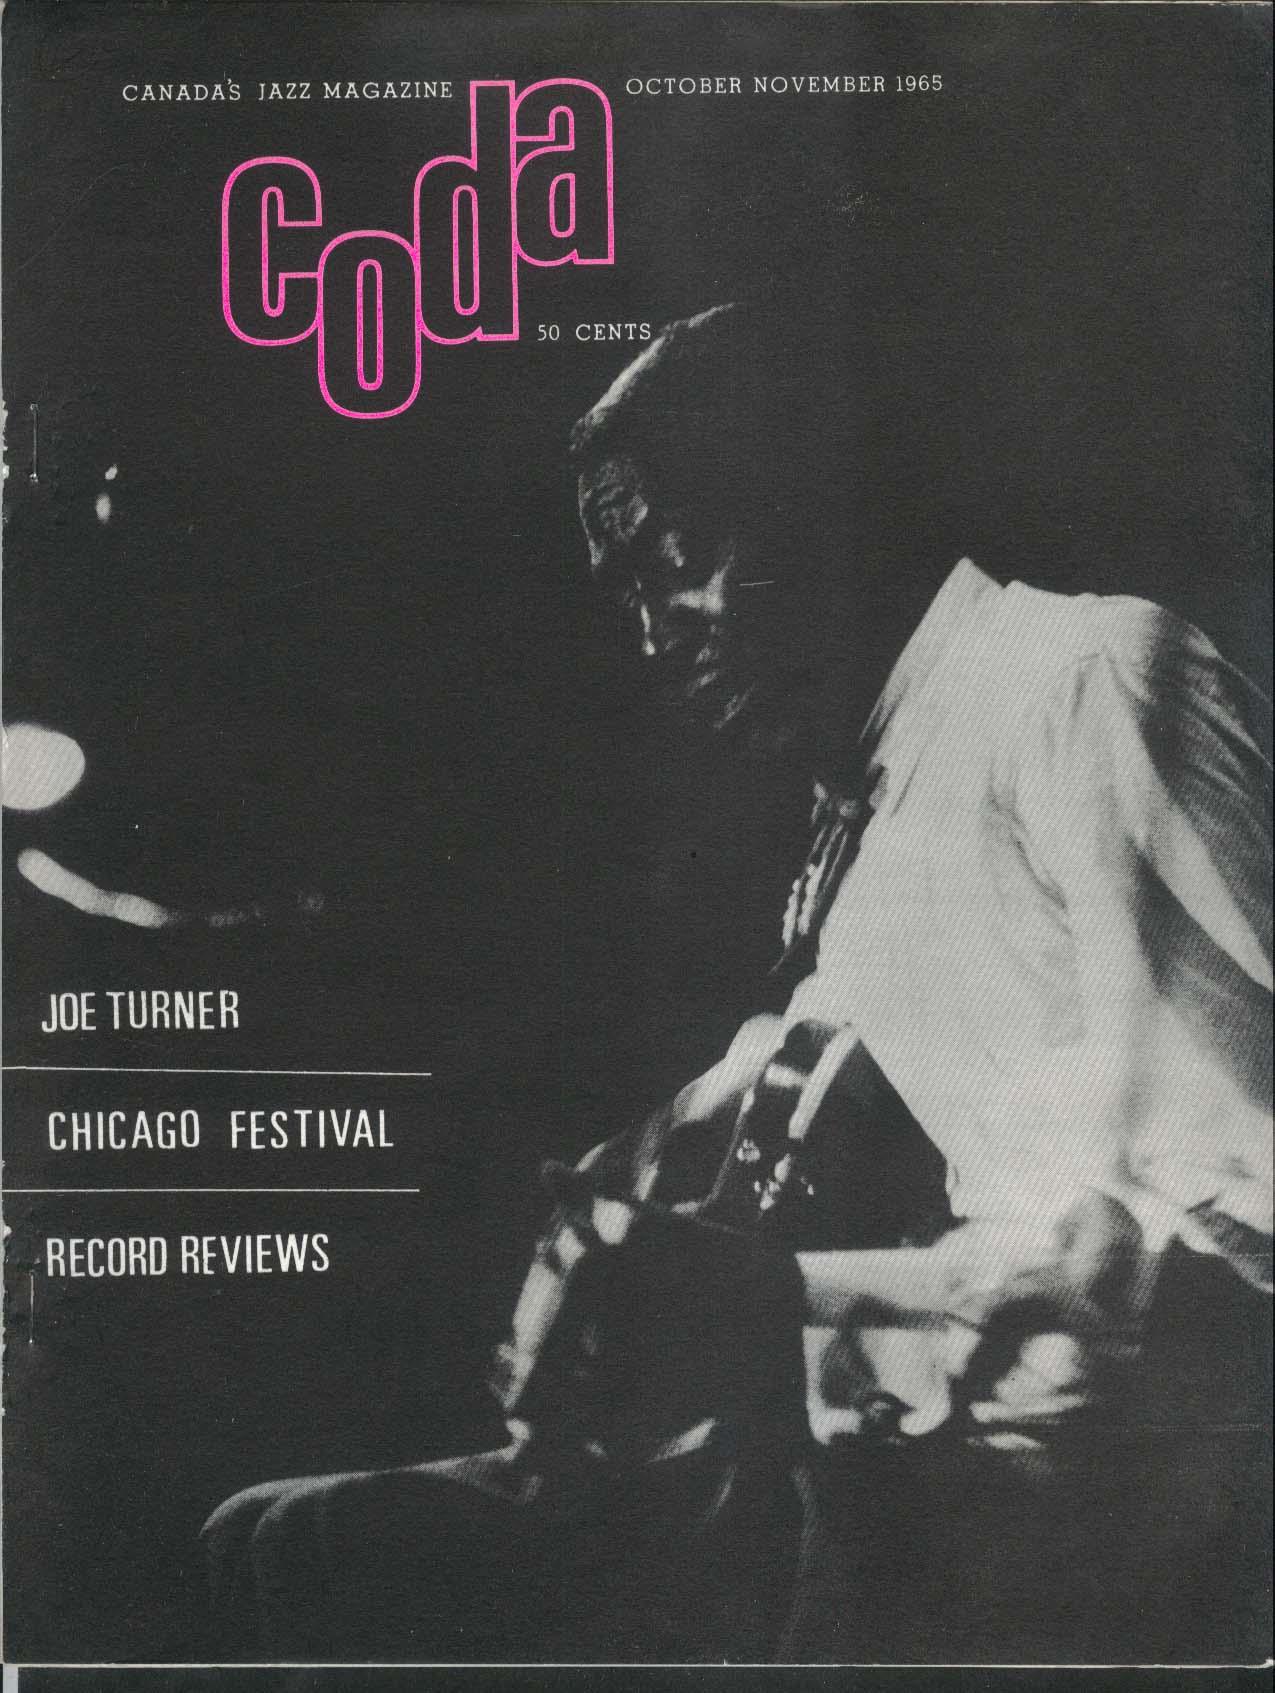 CODA Joe Turner Chicago Festival New York Jazz Happenings 10-11 1965